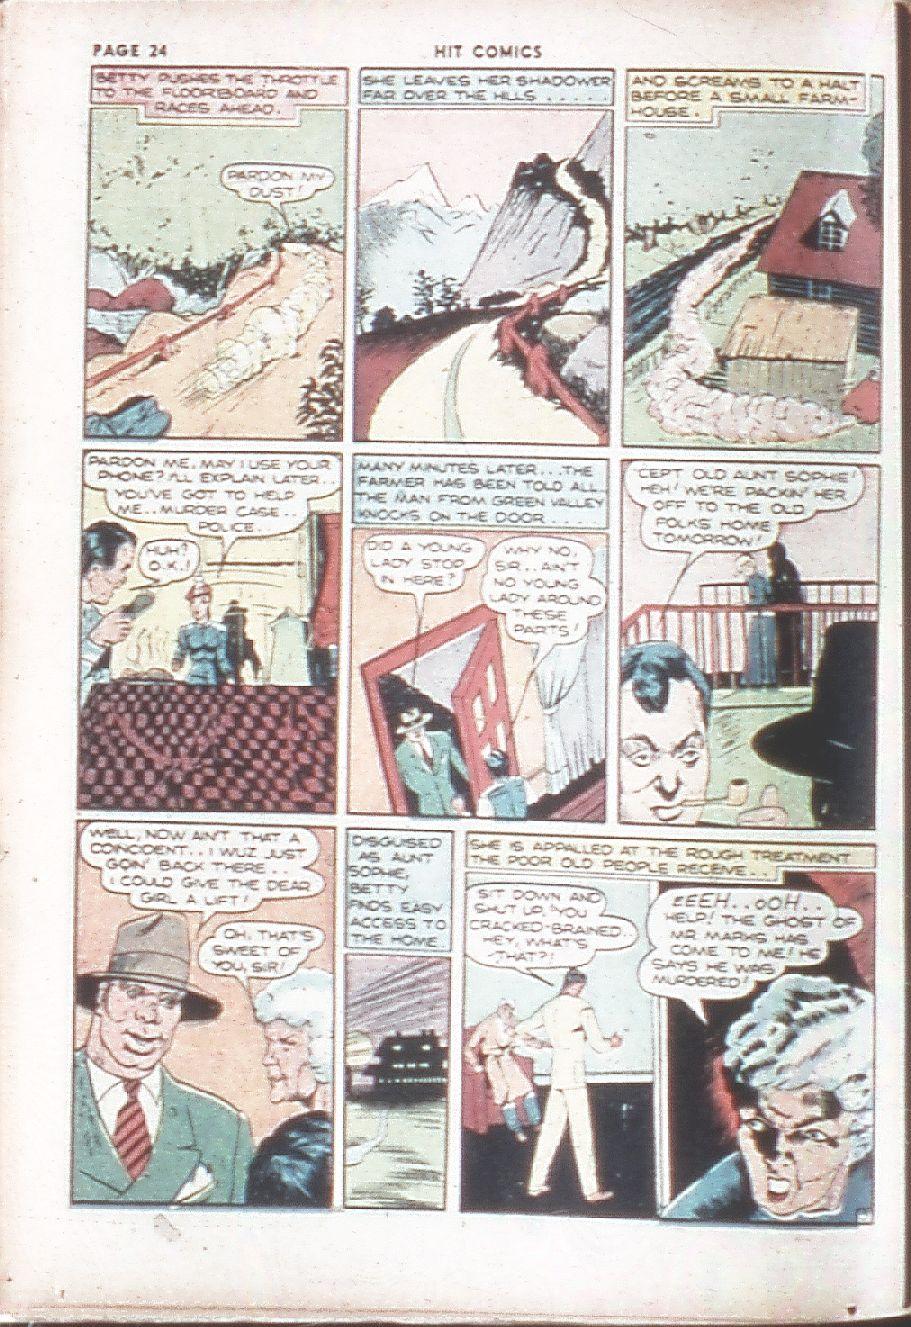 Read online Hit Comics comic -  Issue #7 - 26